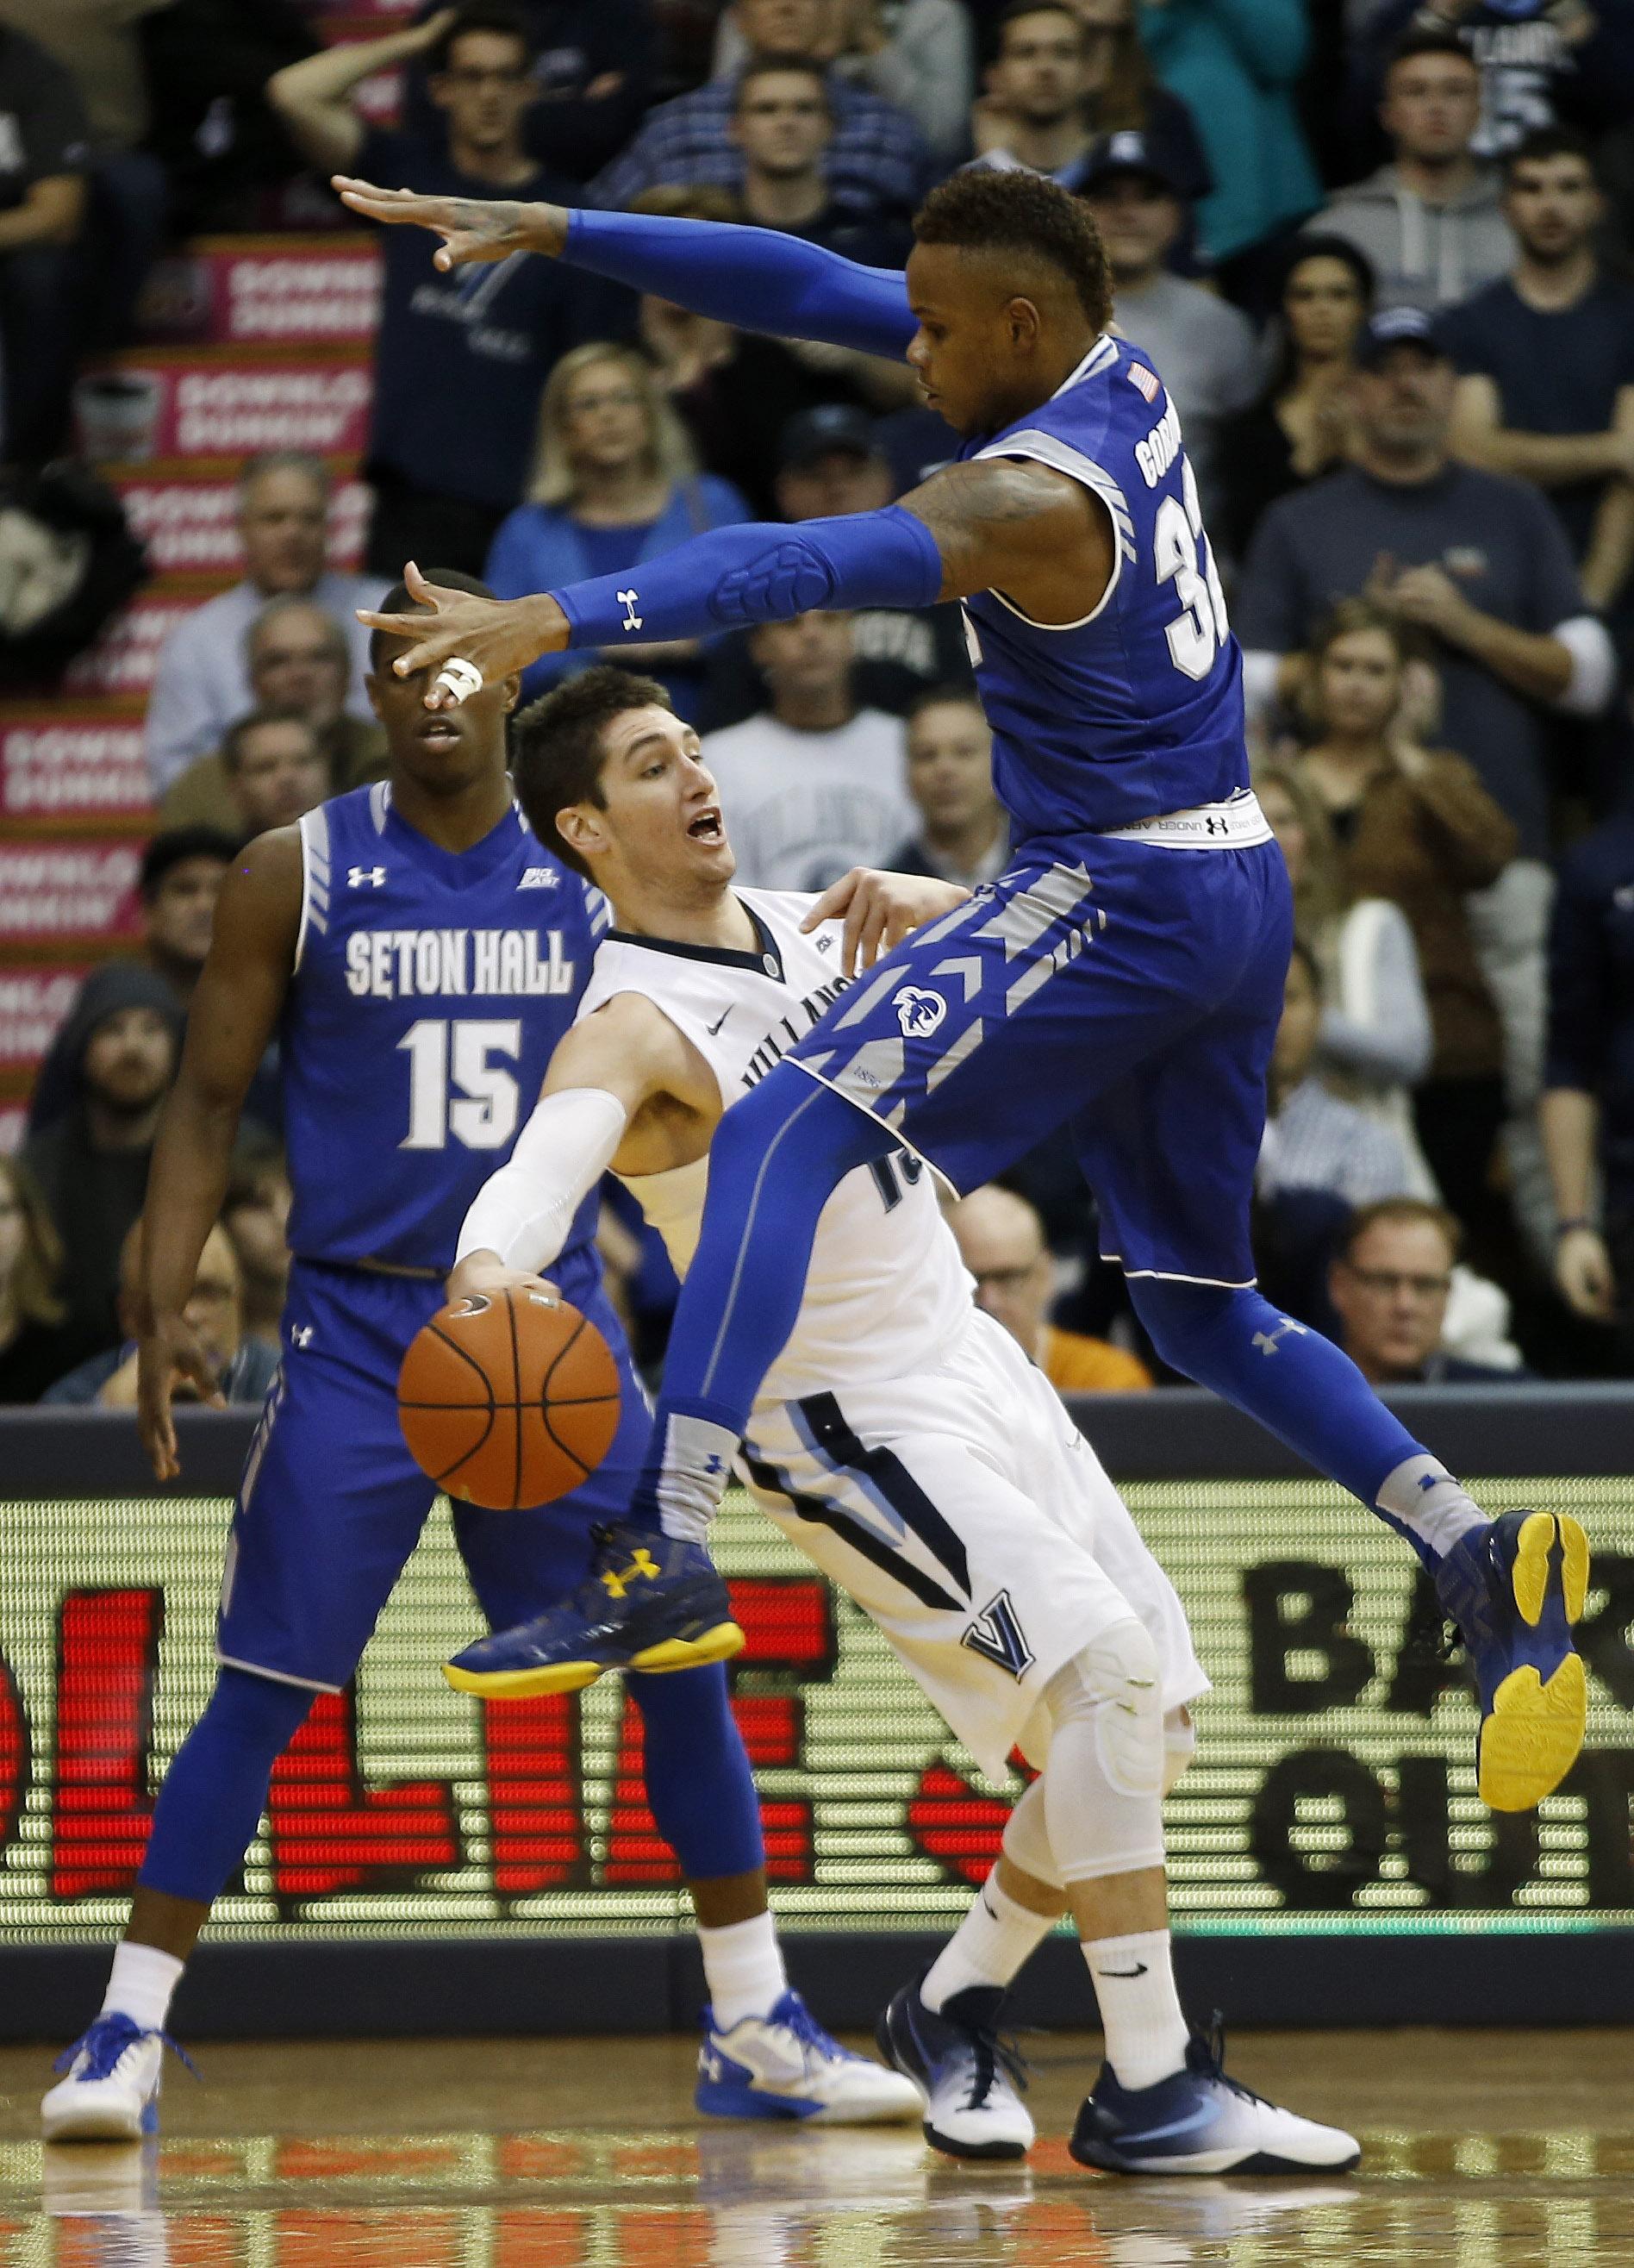 Seton Hall's Angel Delgado, right, tries to block a pass by Villanova's Ryan Arcidiacono during the first half of an NCAA college basketball game, Wednesday, Jan. 6, 2016, in Villanova, Pa. (AP Photo/Matt Slocum)